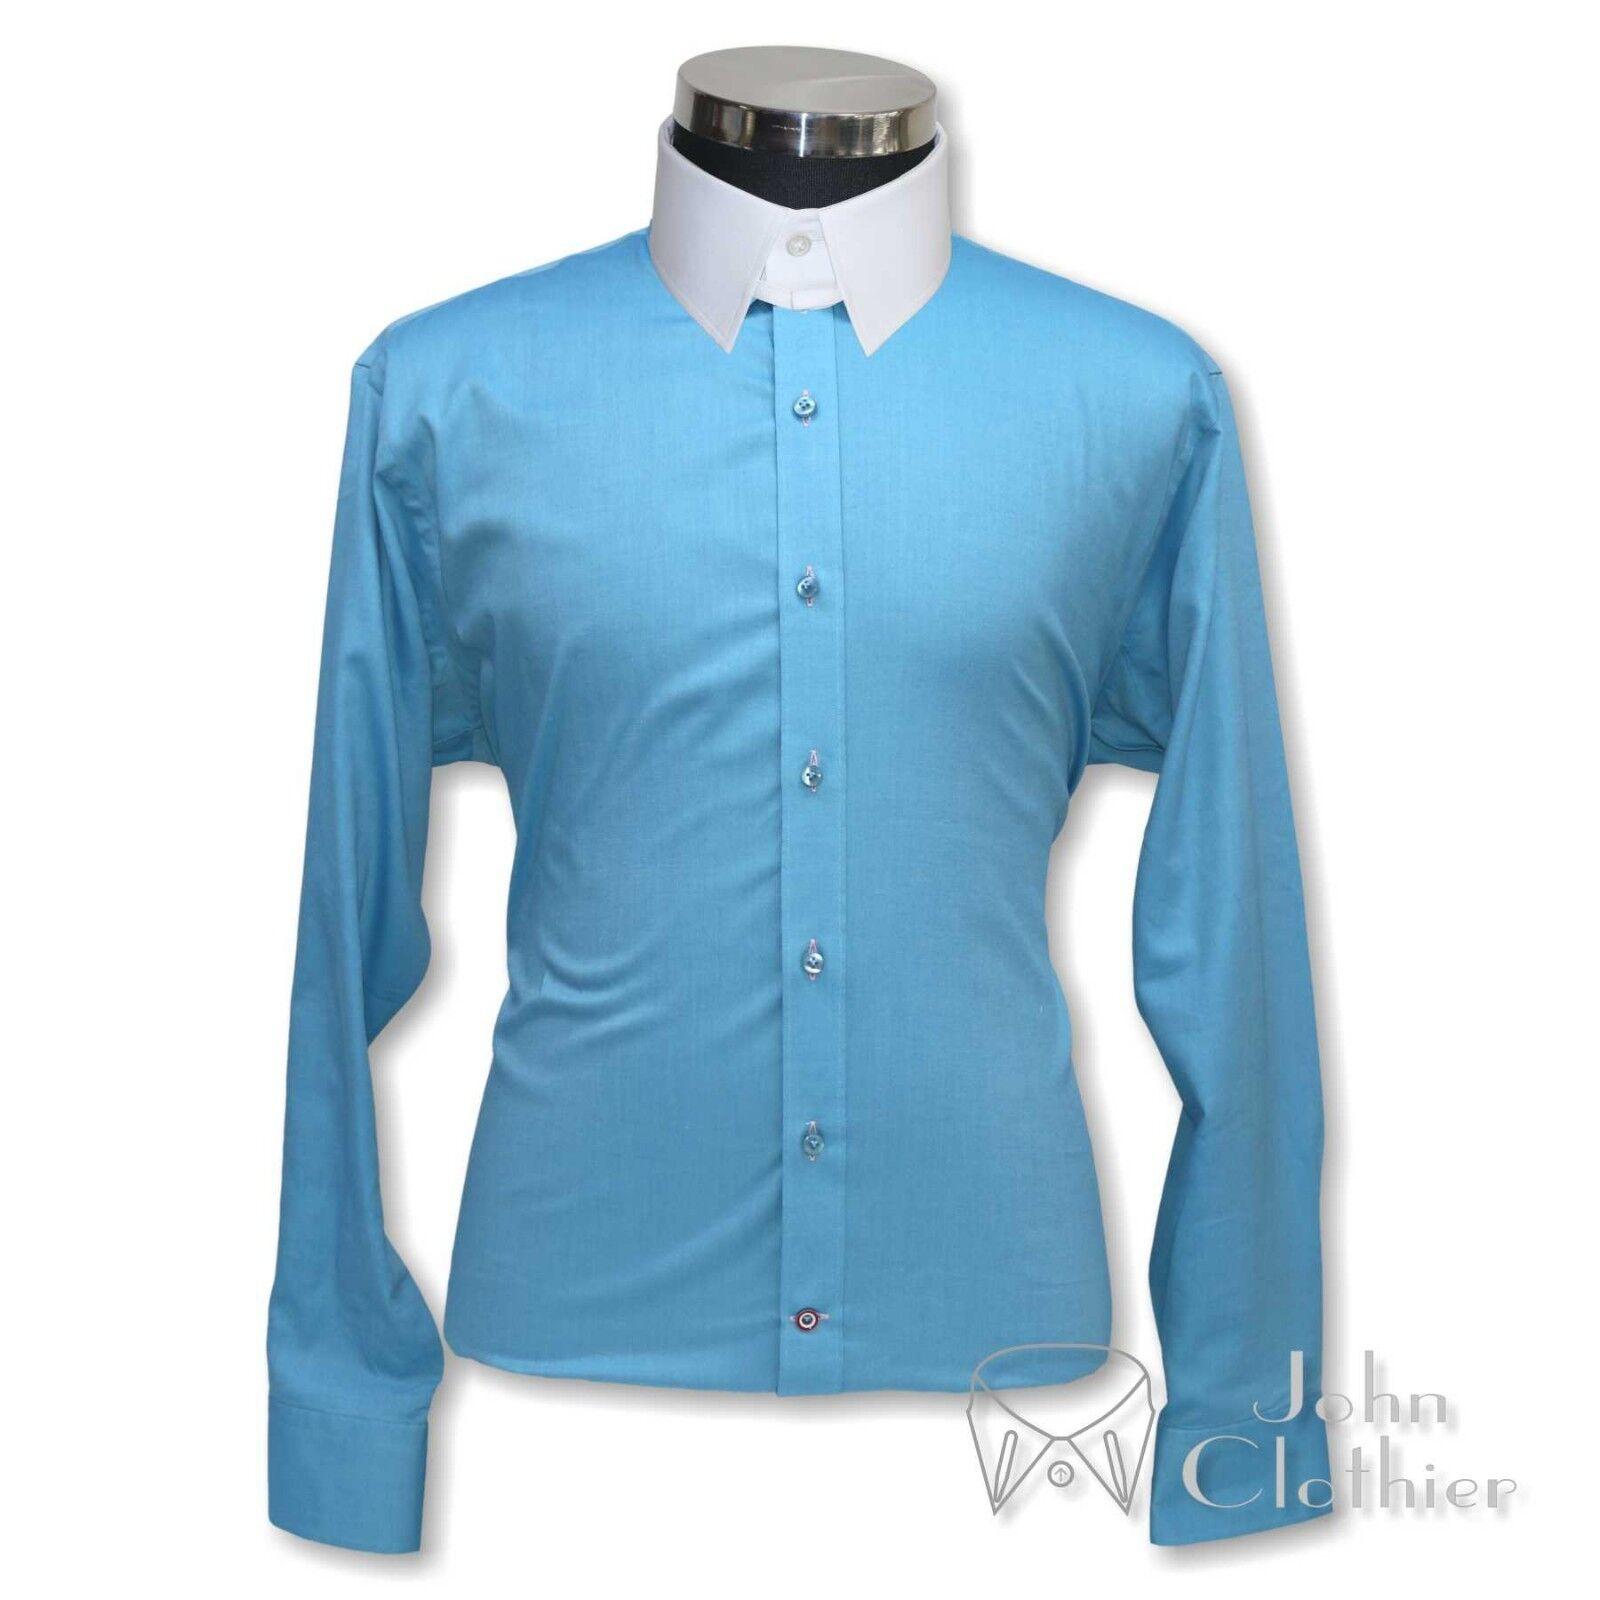 Herren Sea Blau oxford Tab collar Bankers Cotton shirts Loop James Bond for Gents